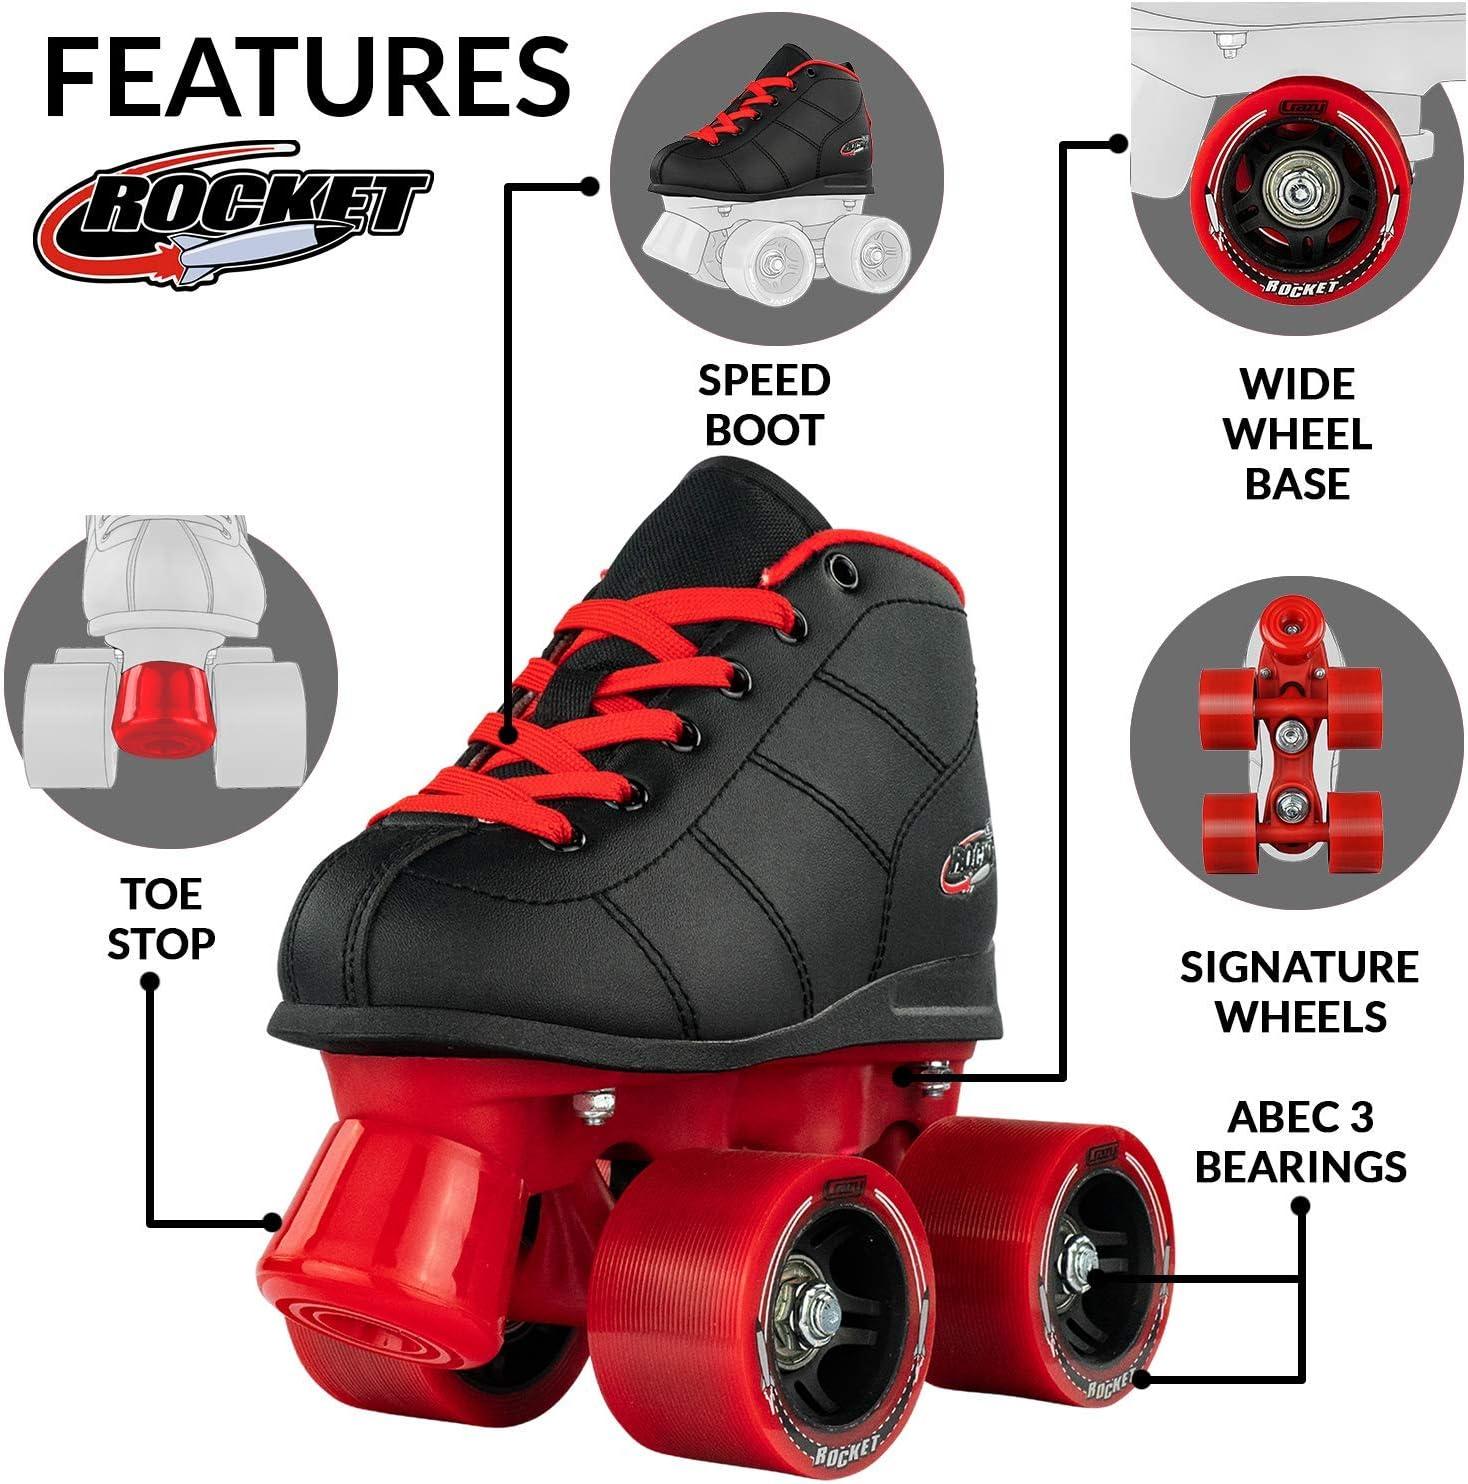 Crazy Skates Rocket Roller Skates for Boys and Girls Great Beginner Kids Quad Skates Black and Red Patines Size 3.5